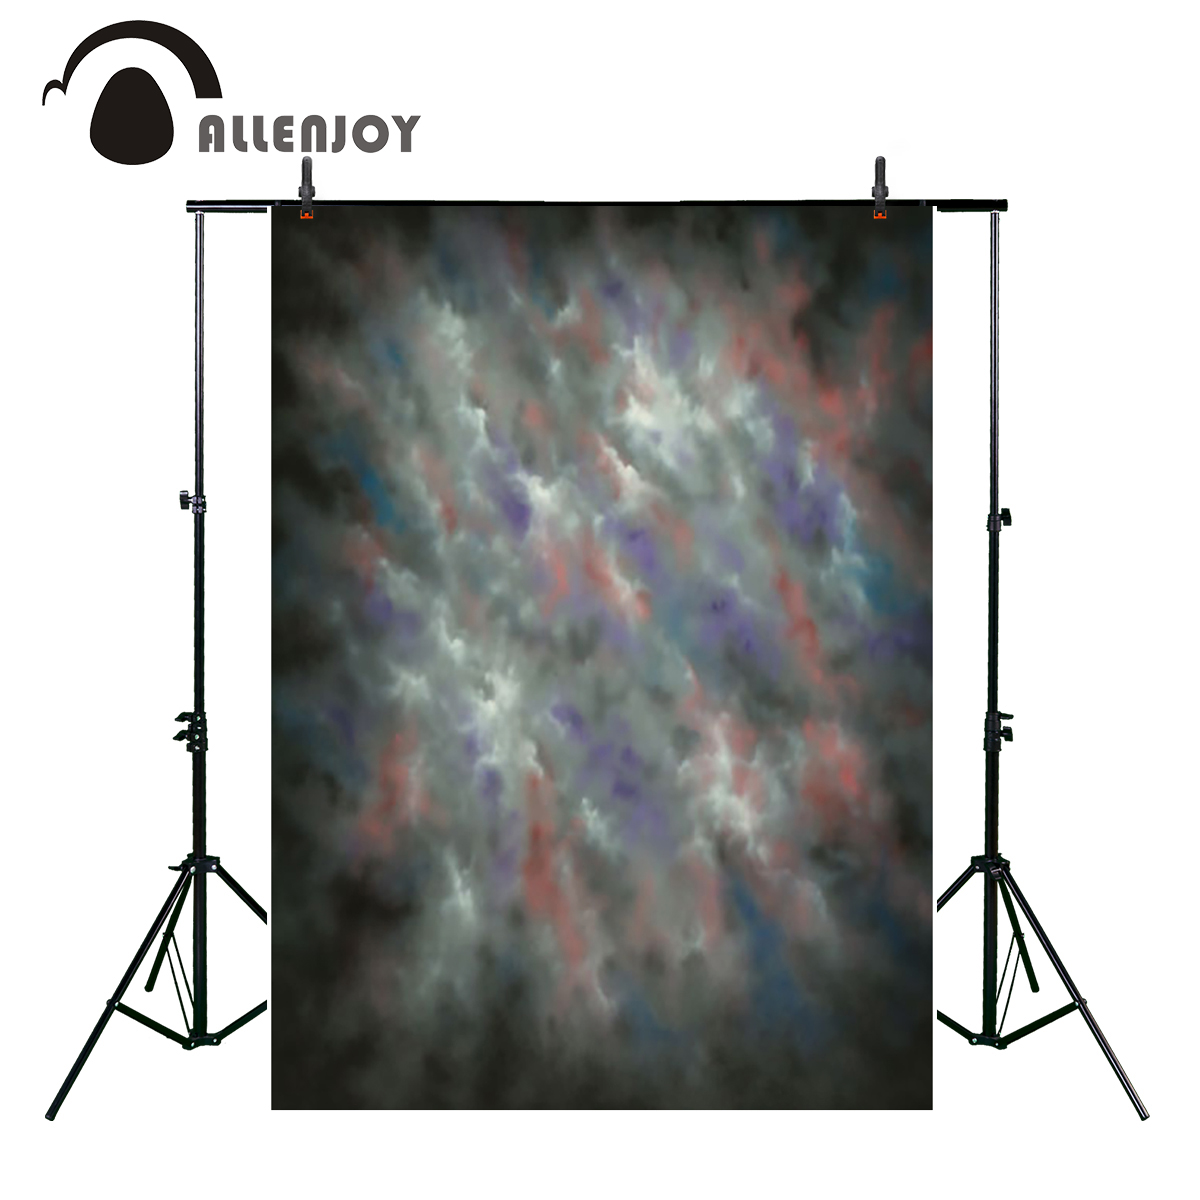 Allenjoy gray clouds haze blended old master photography background vintage dyed Computer Print portrait backdrop photo studio